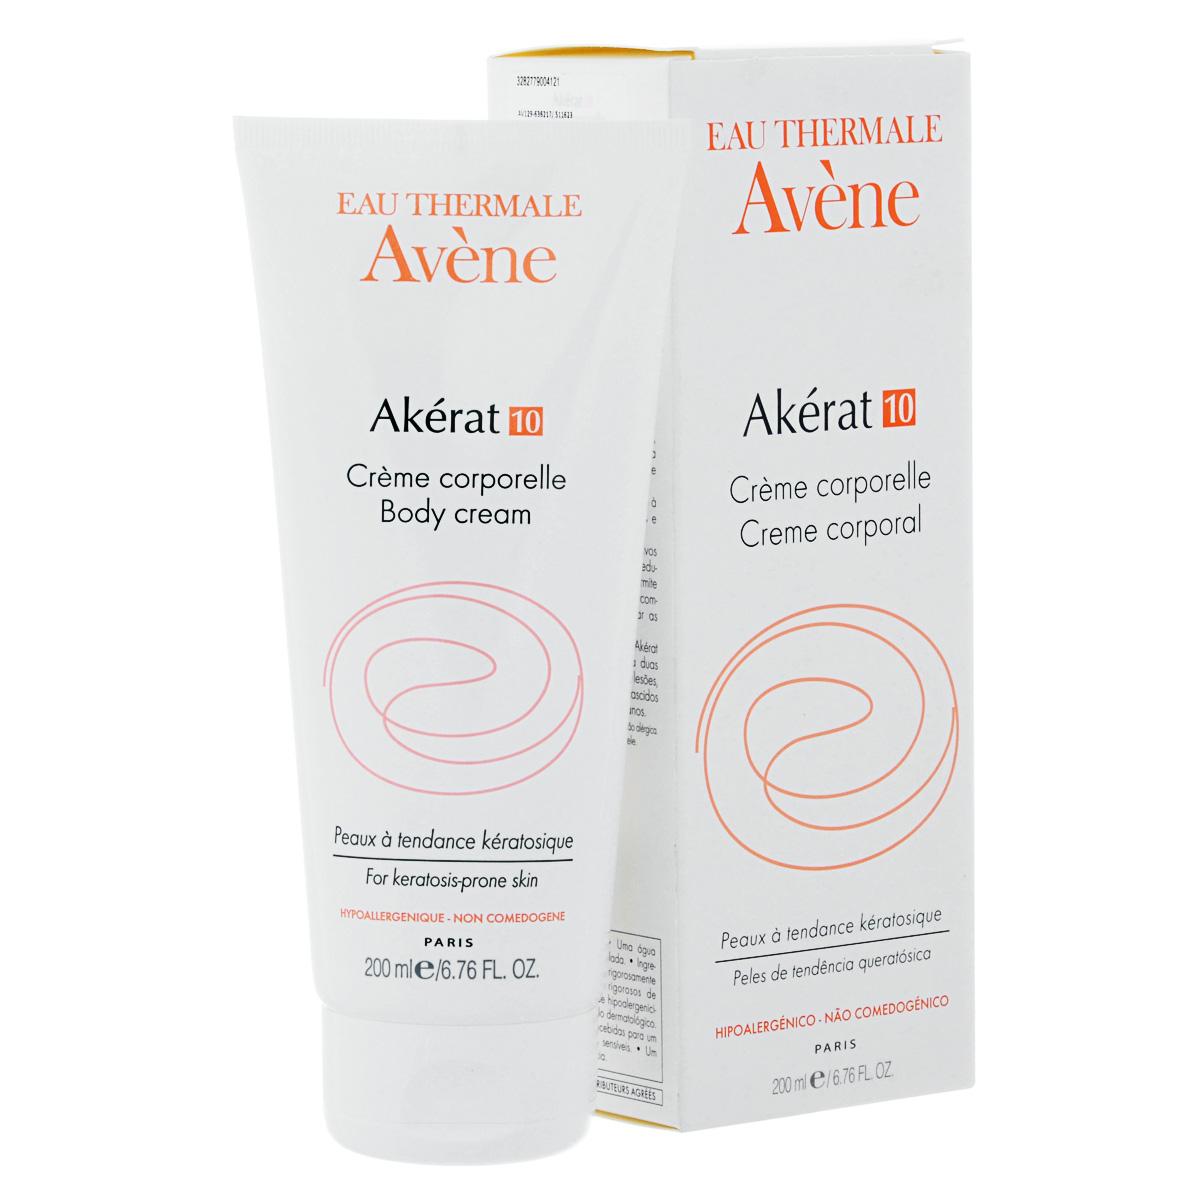 Avene Интенсивный увлажняющий крем Akerat для тела 200мл